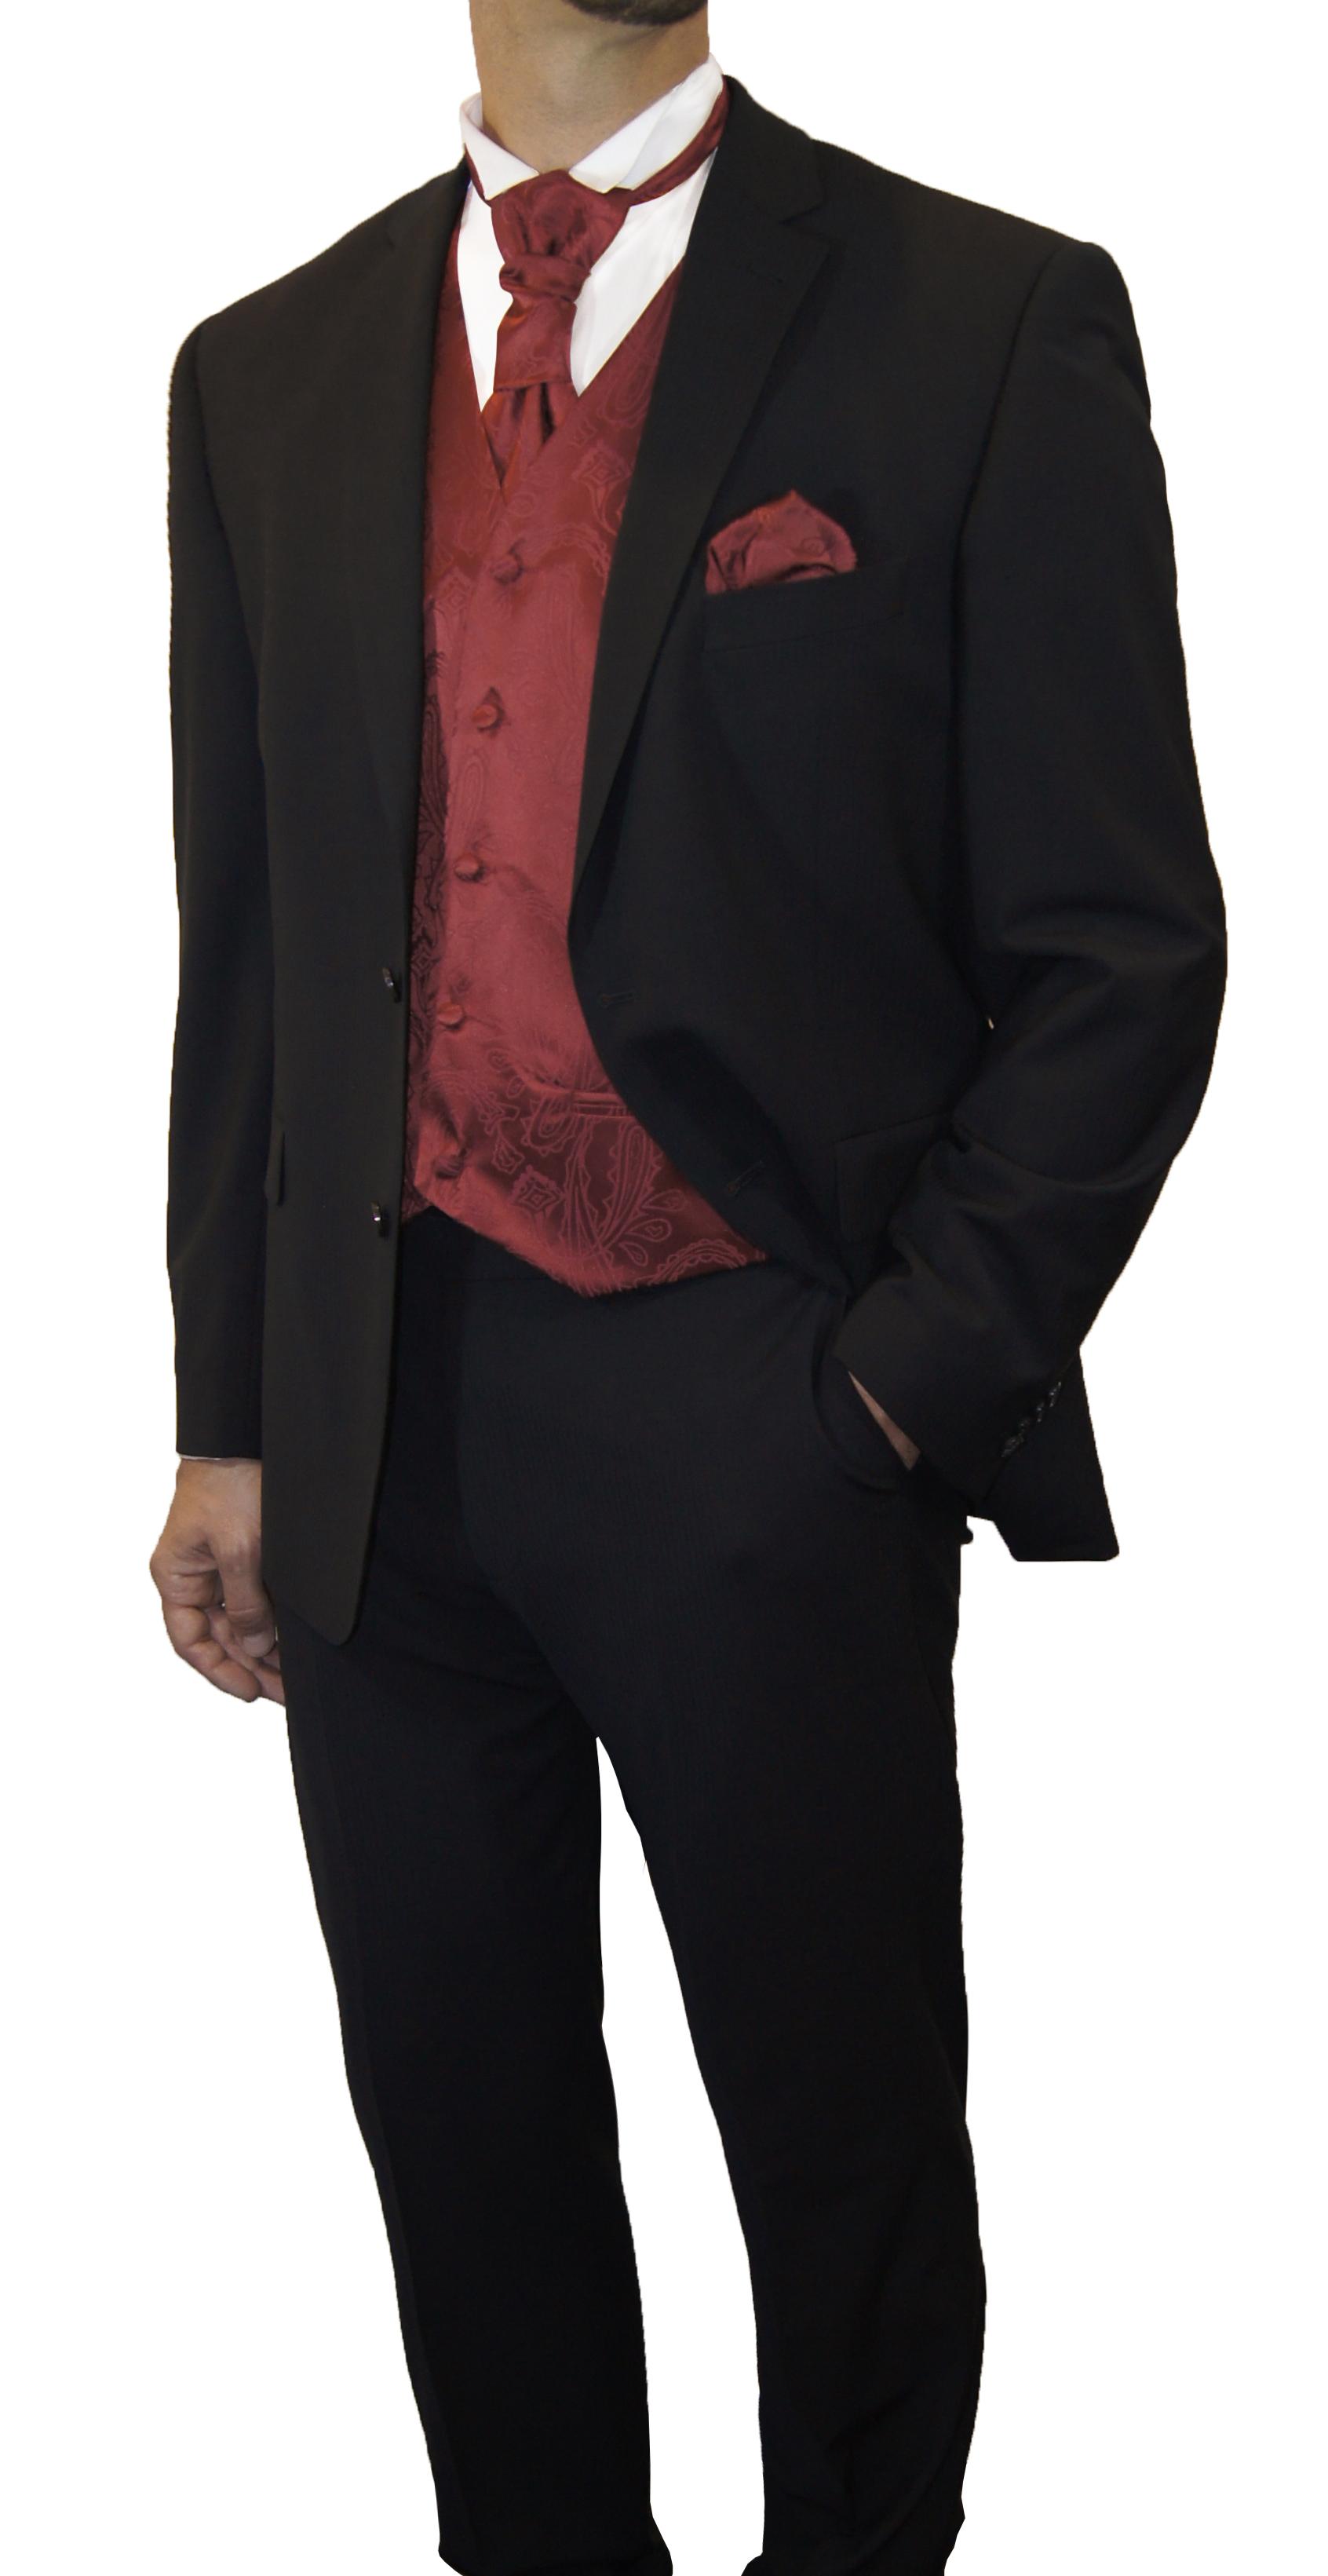 Wedding tuxedo black with boys suit black red   Paul Malone Shop